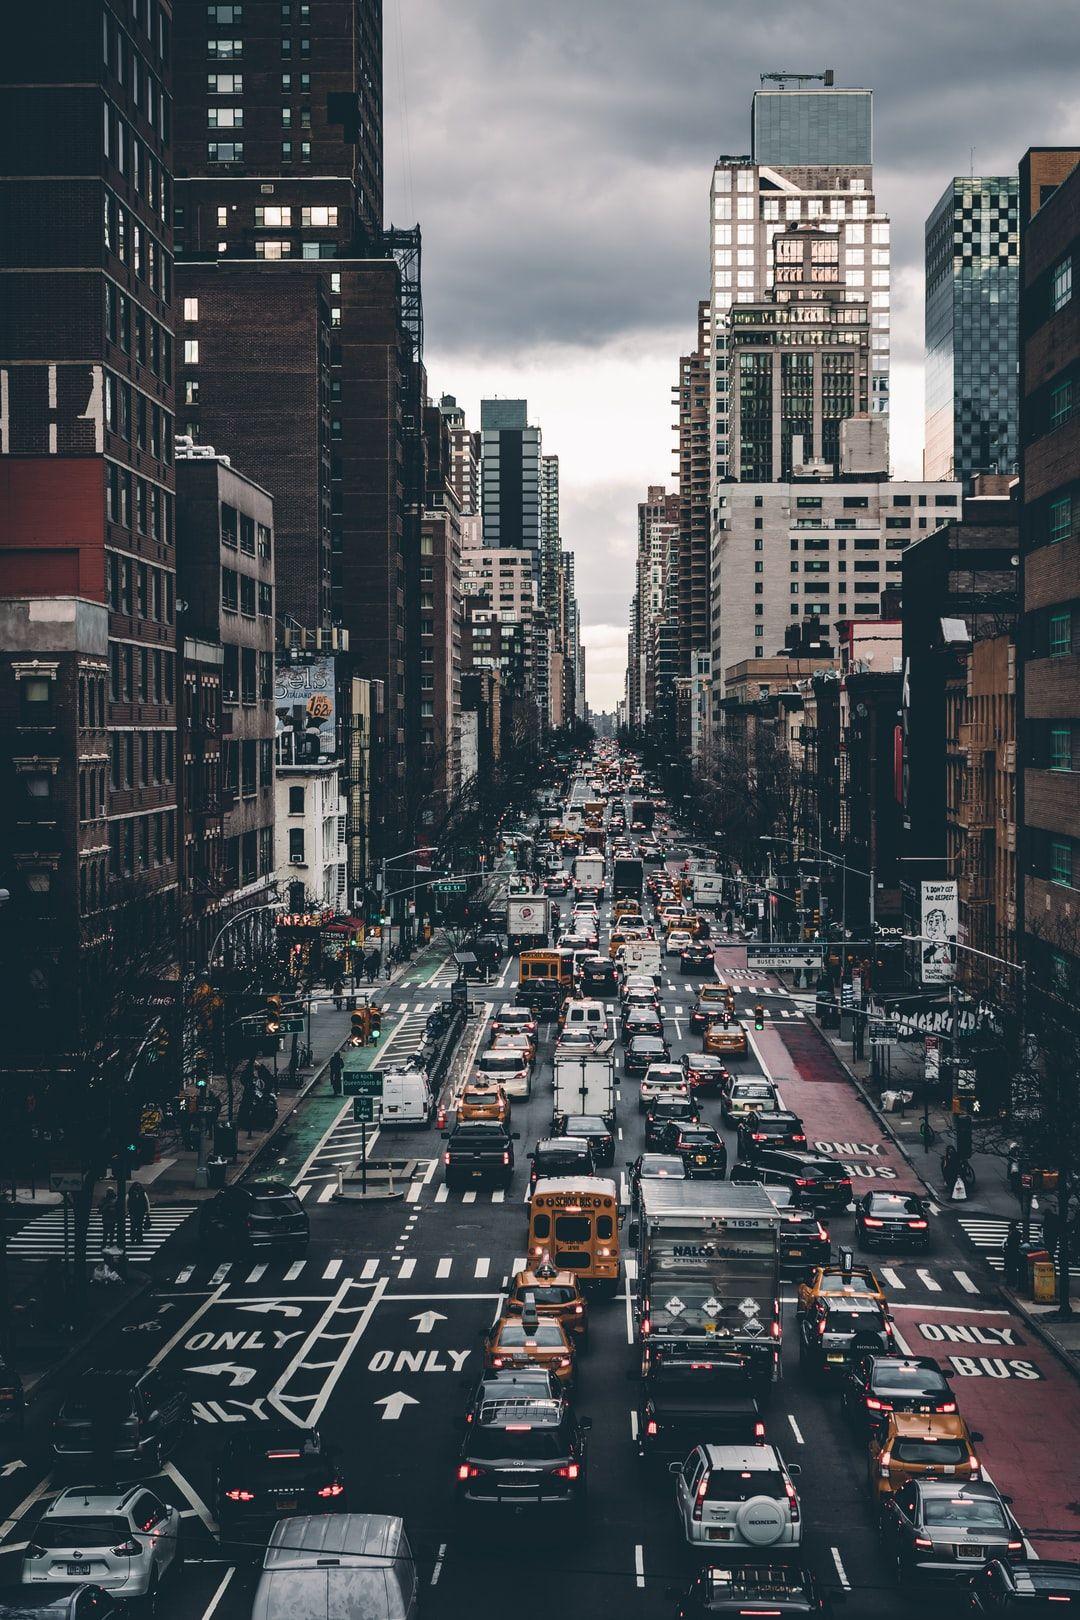 2019 Iphone 11 Wallpapers W New York City Iphone Iphonewallpaper Walpapers Phonewallpaper Pemandangan Fotografi Urban Latar Belakang